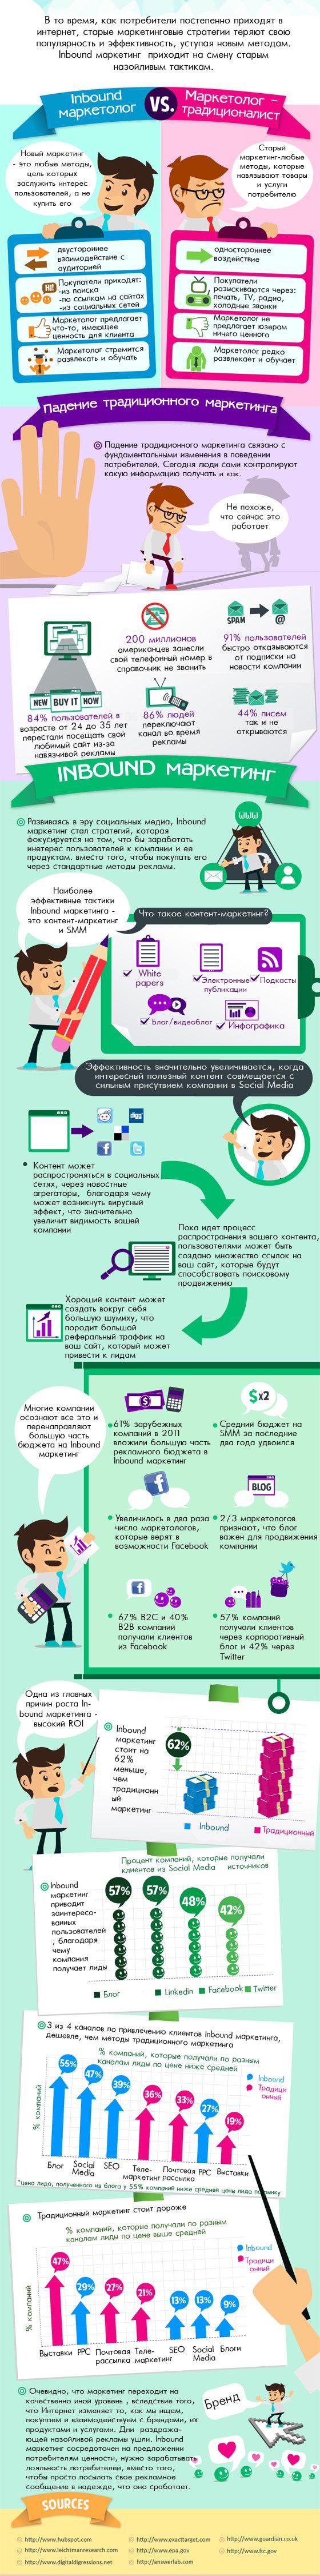 Inbound Маркетинг VS Традиционный Маркетинг  Farpost.ru